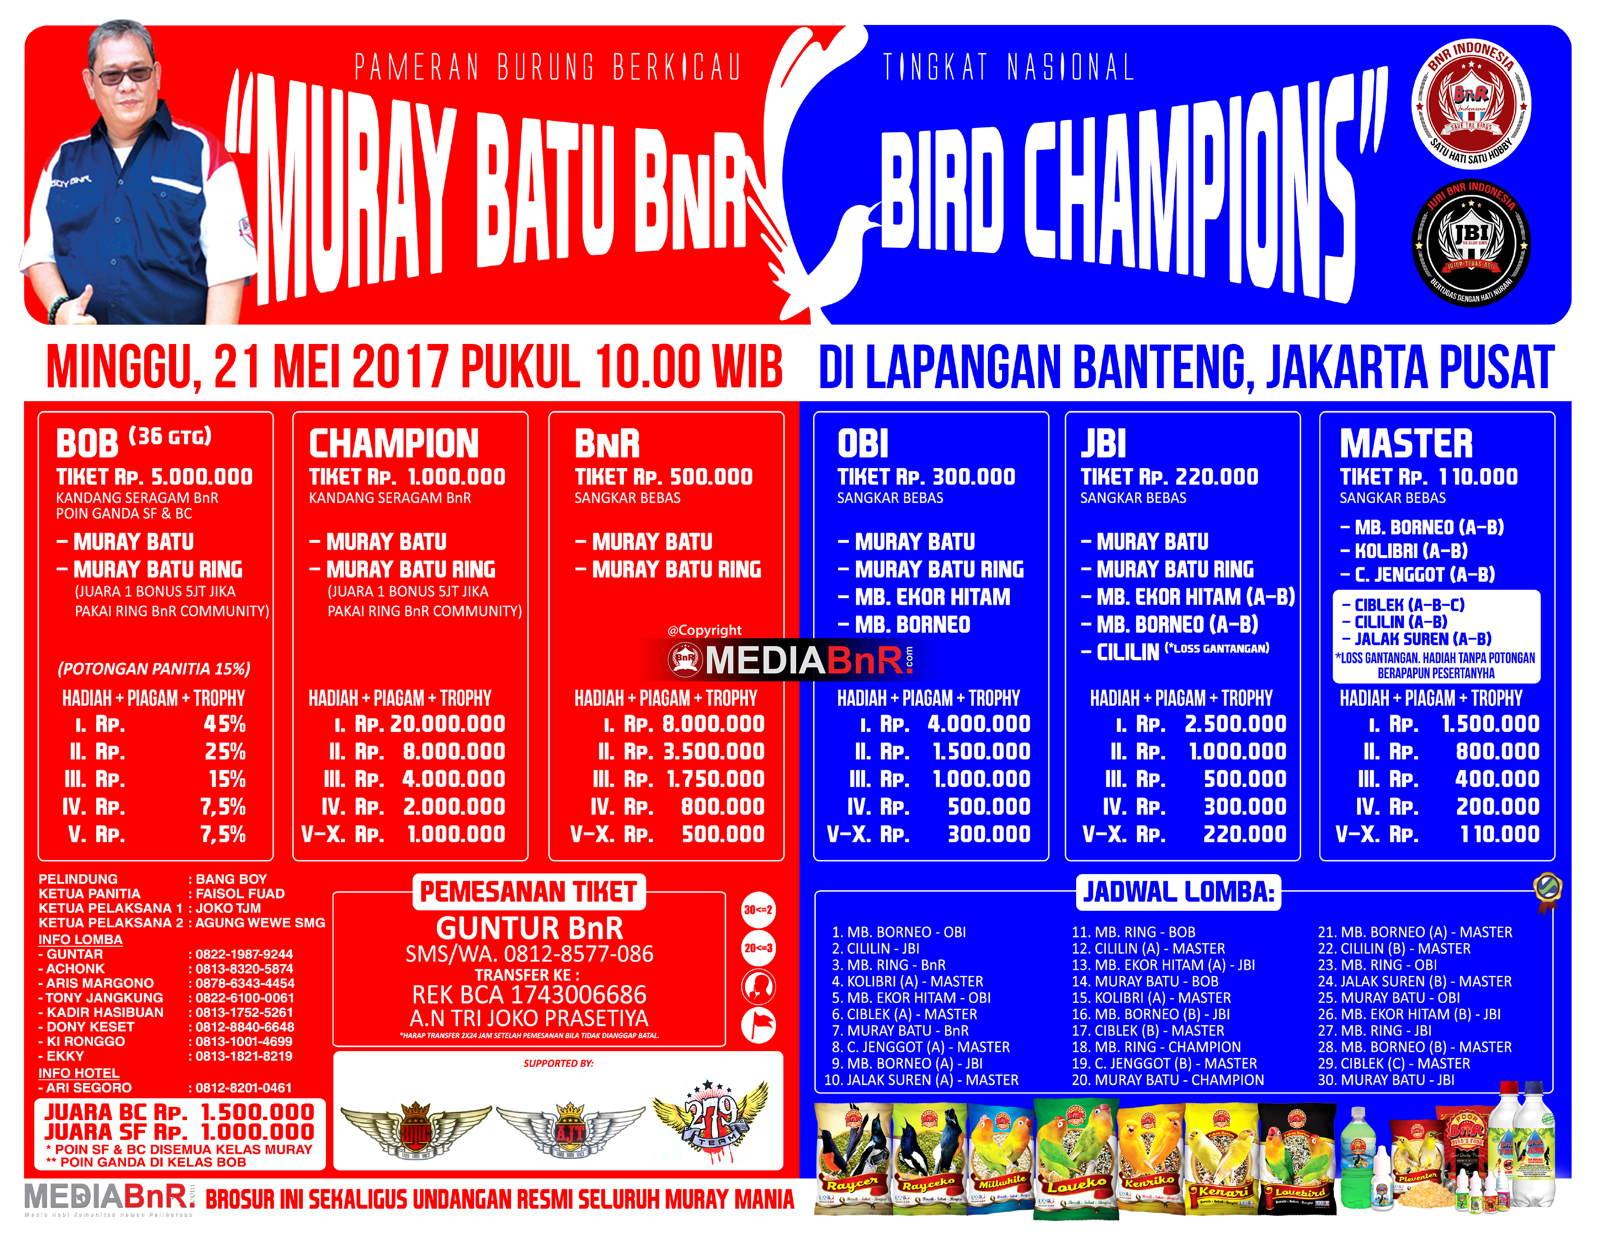 brosur lomba burung kicau murai batu bnr bird champions